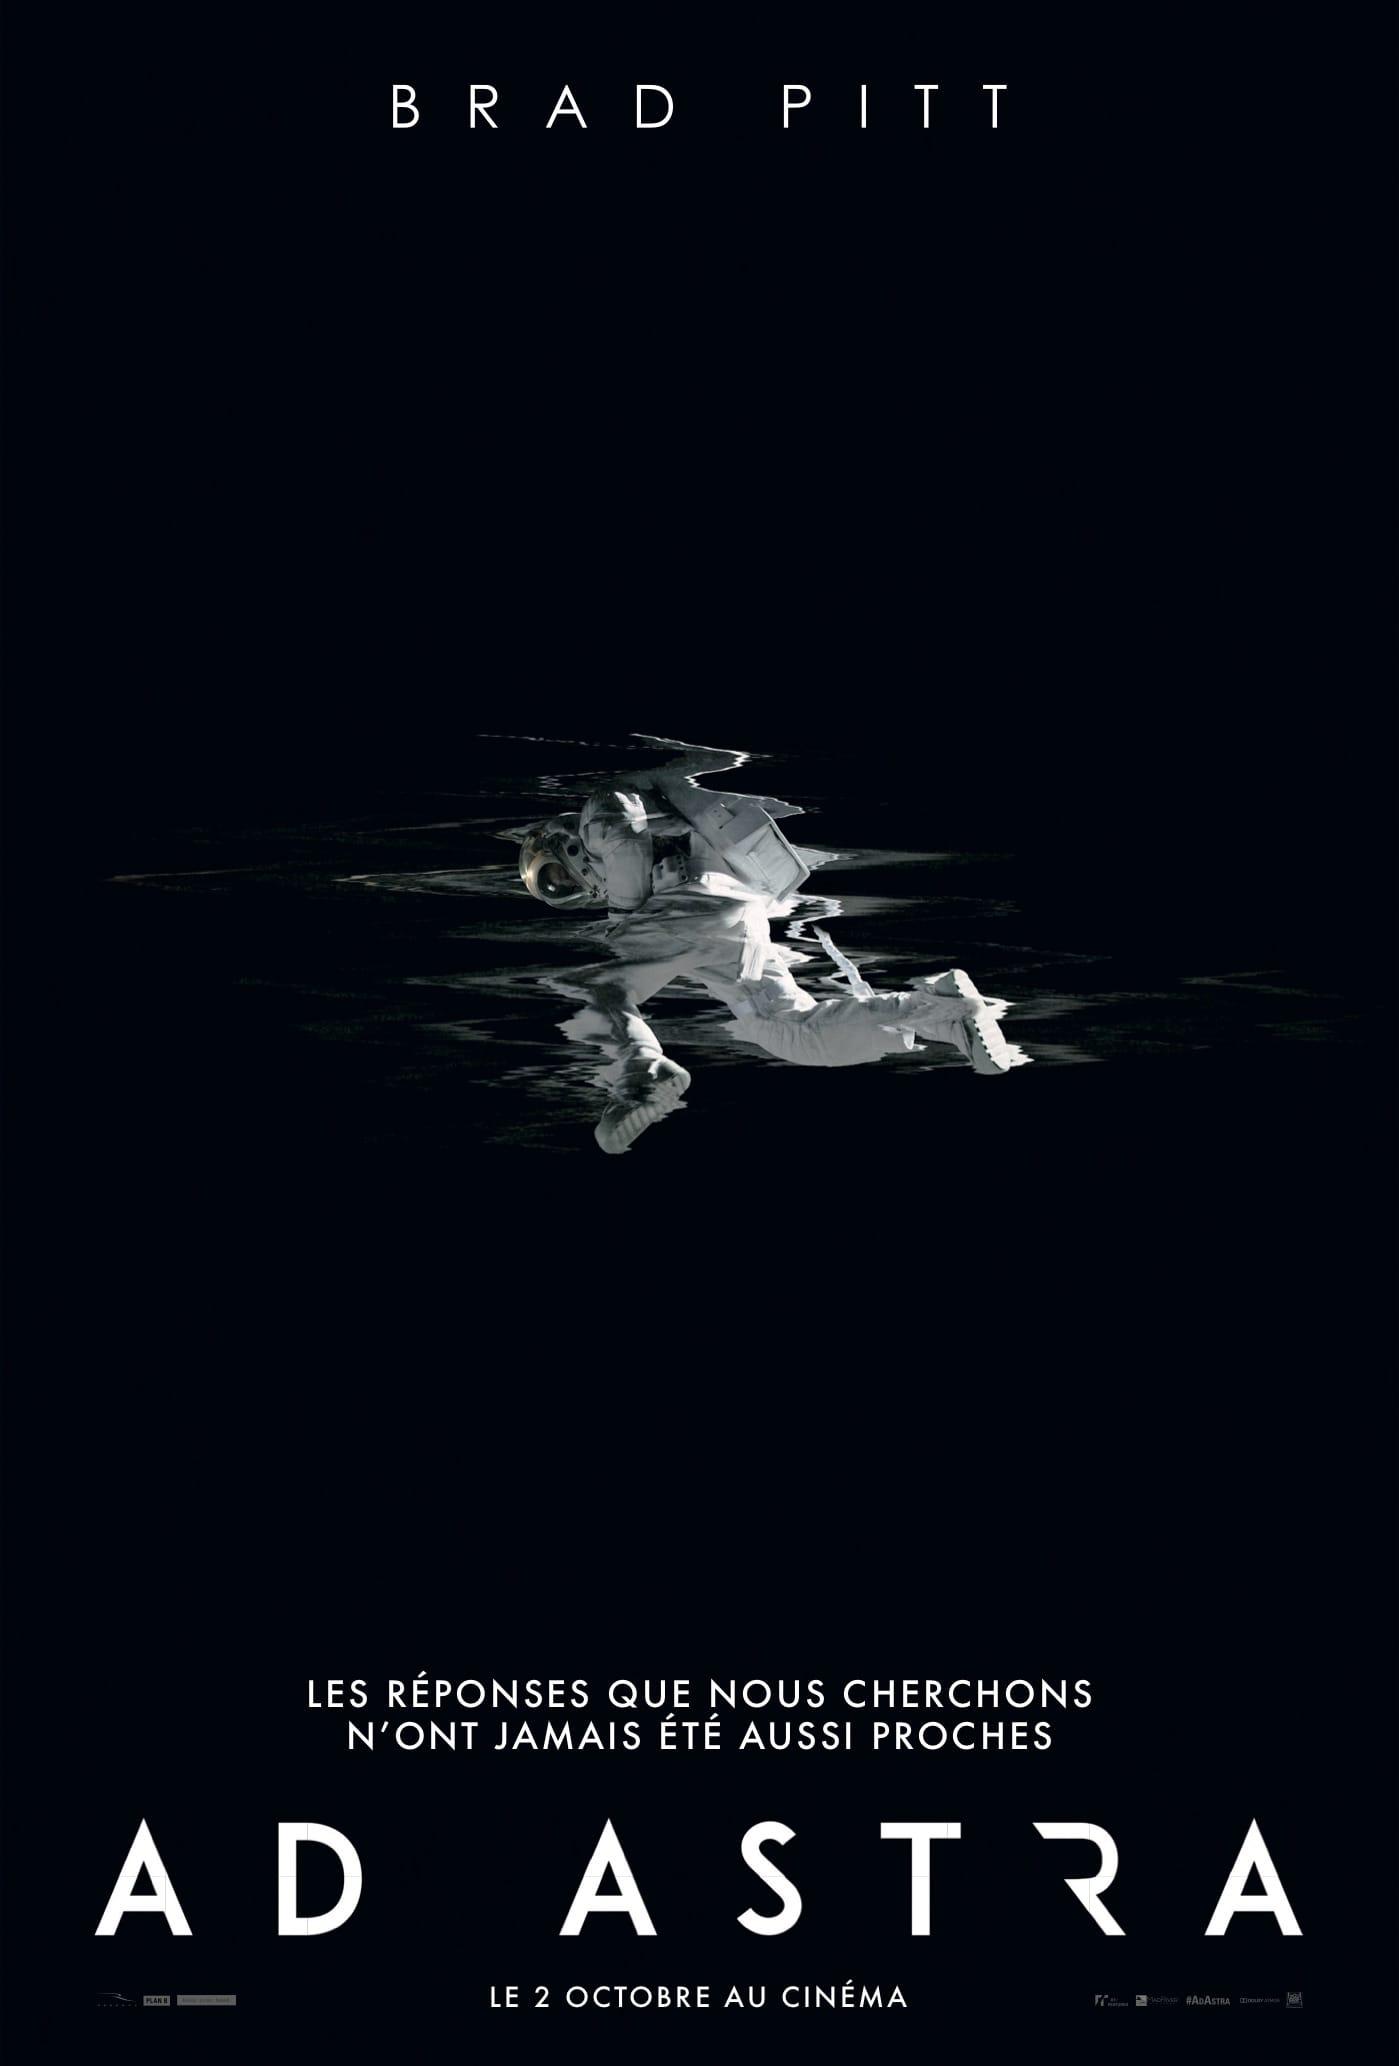 Ad Astra de James Gray affiche teaser film cinéma